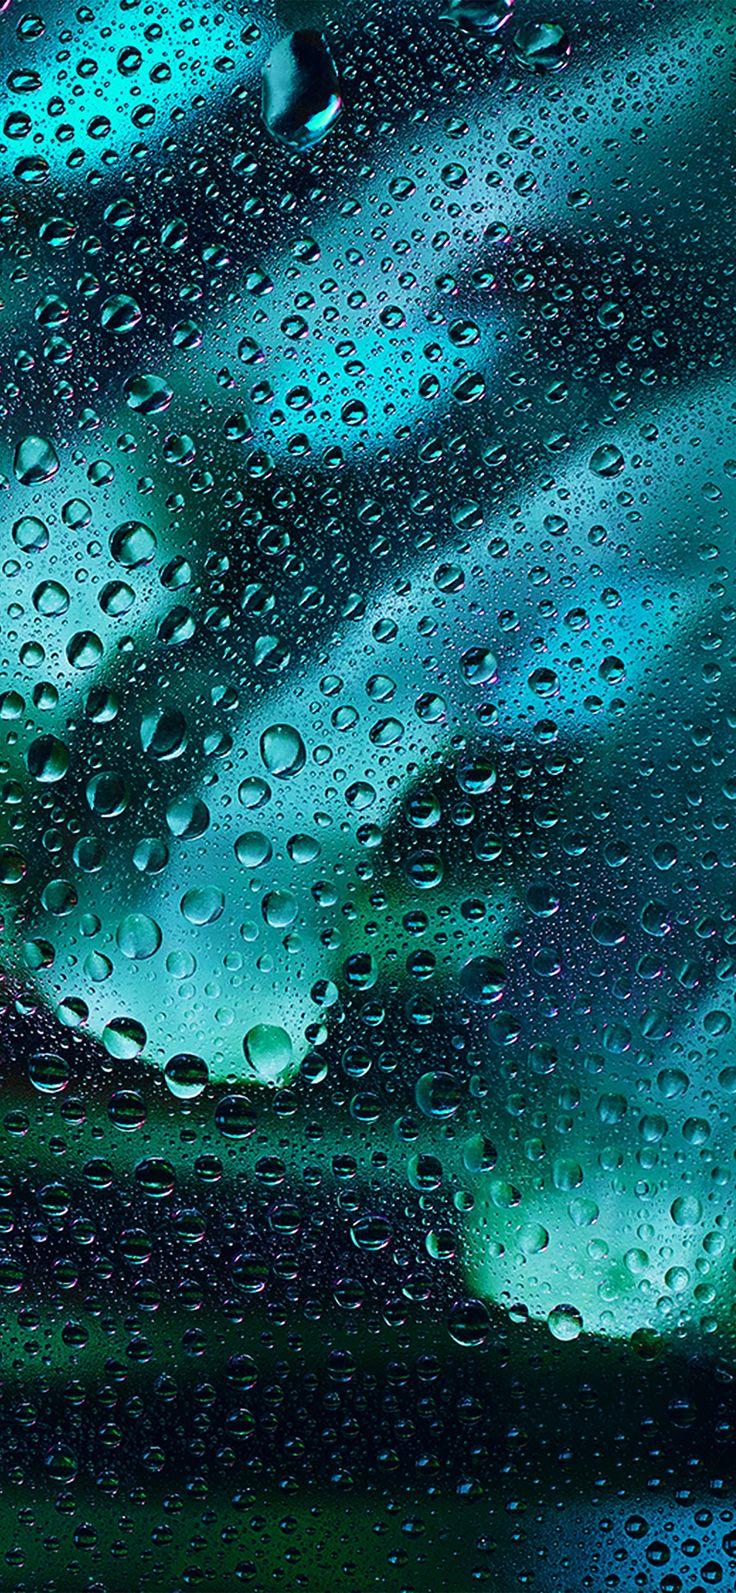 Iphone X Wallpaper Vx11 Rainy Bubble Blue Dark Window